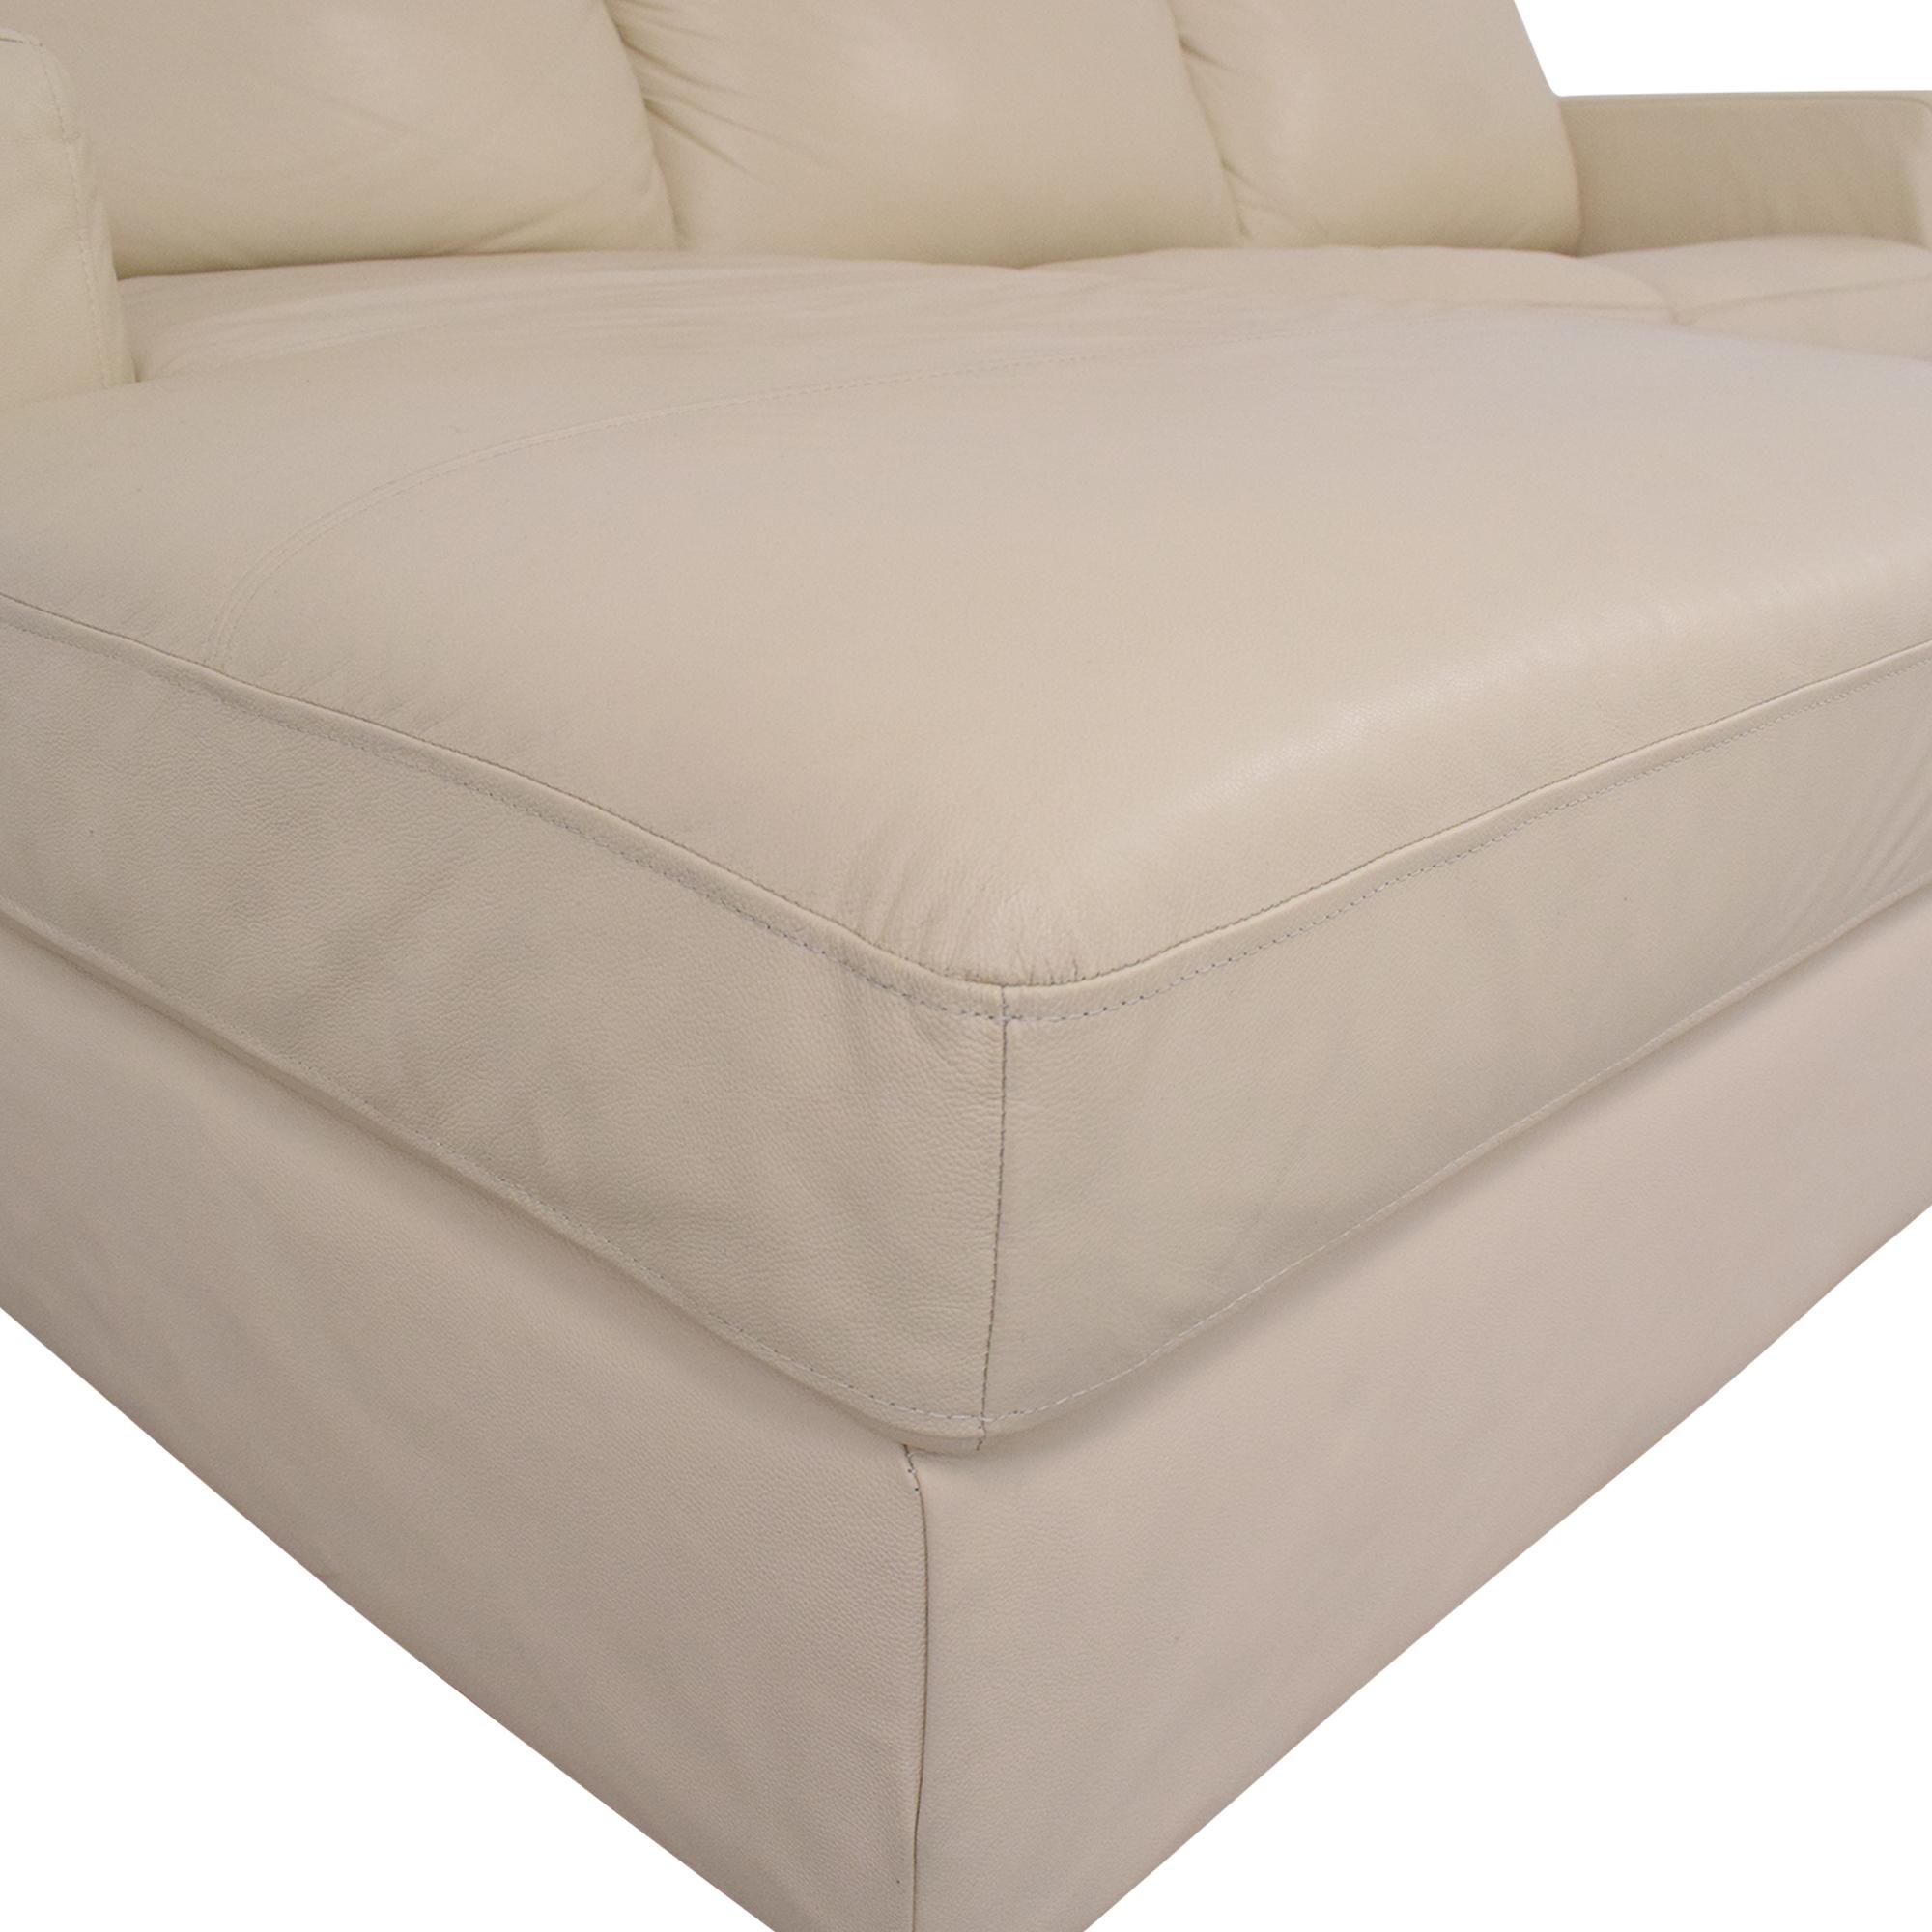 J&M Furniture J&M Furniture Jenny Sectional Sleeper Sofa pa